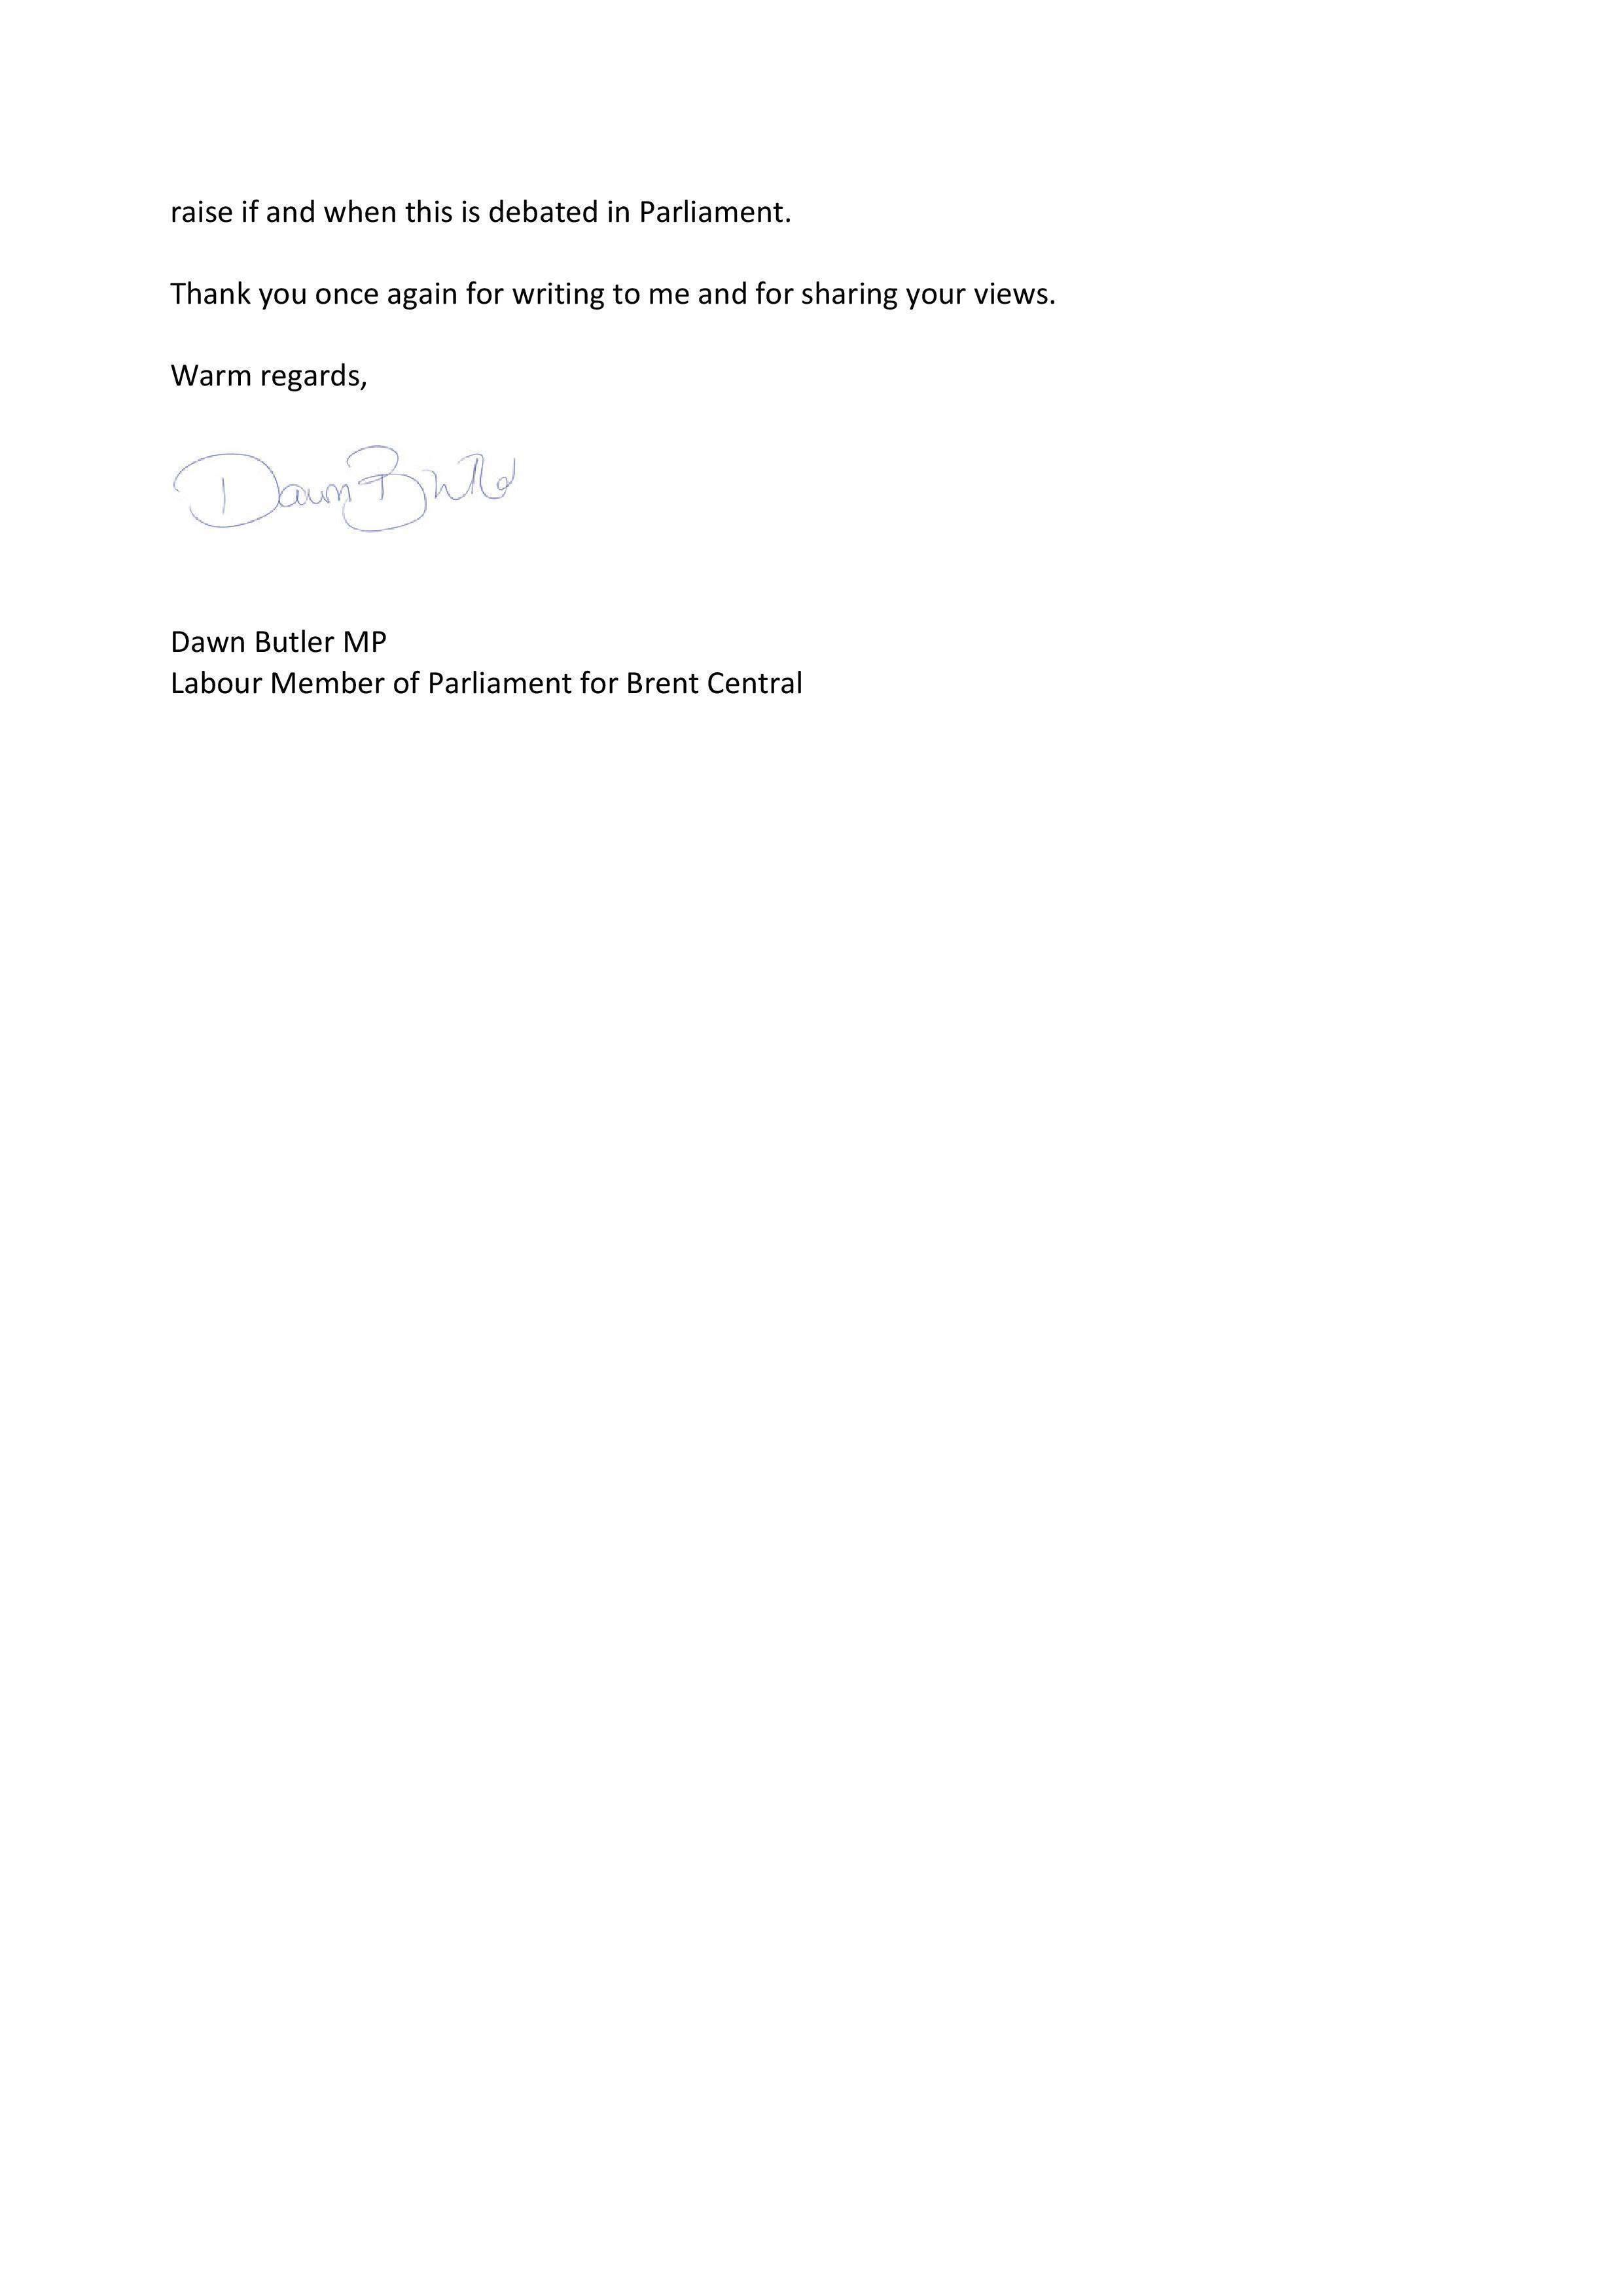 seal_slaughter_letter-page-002.jpg